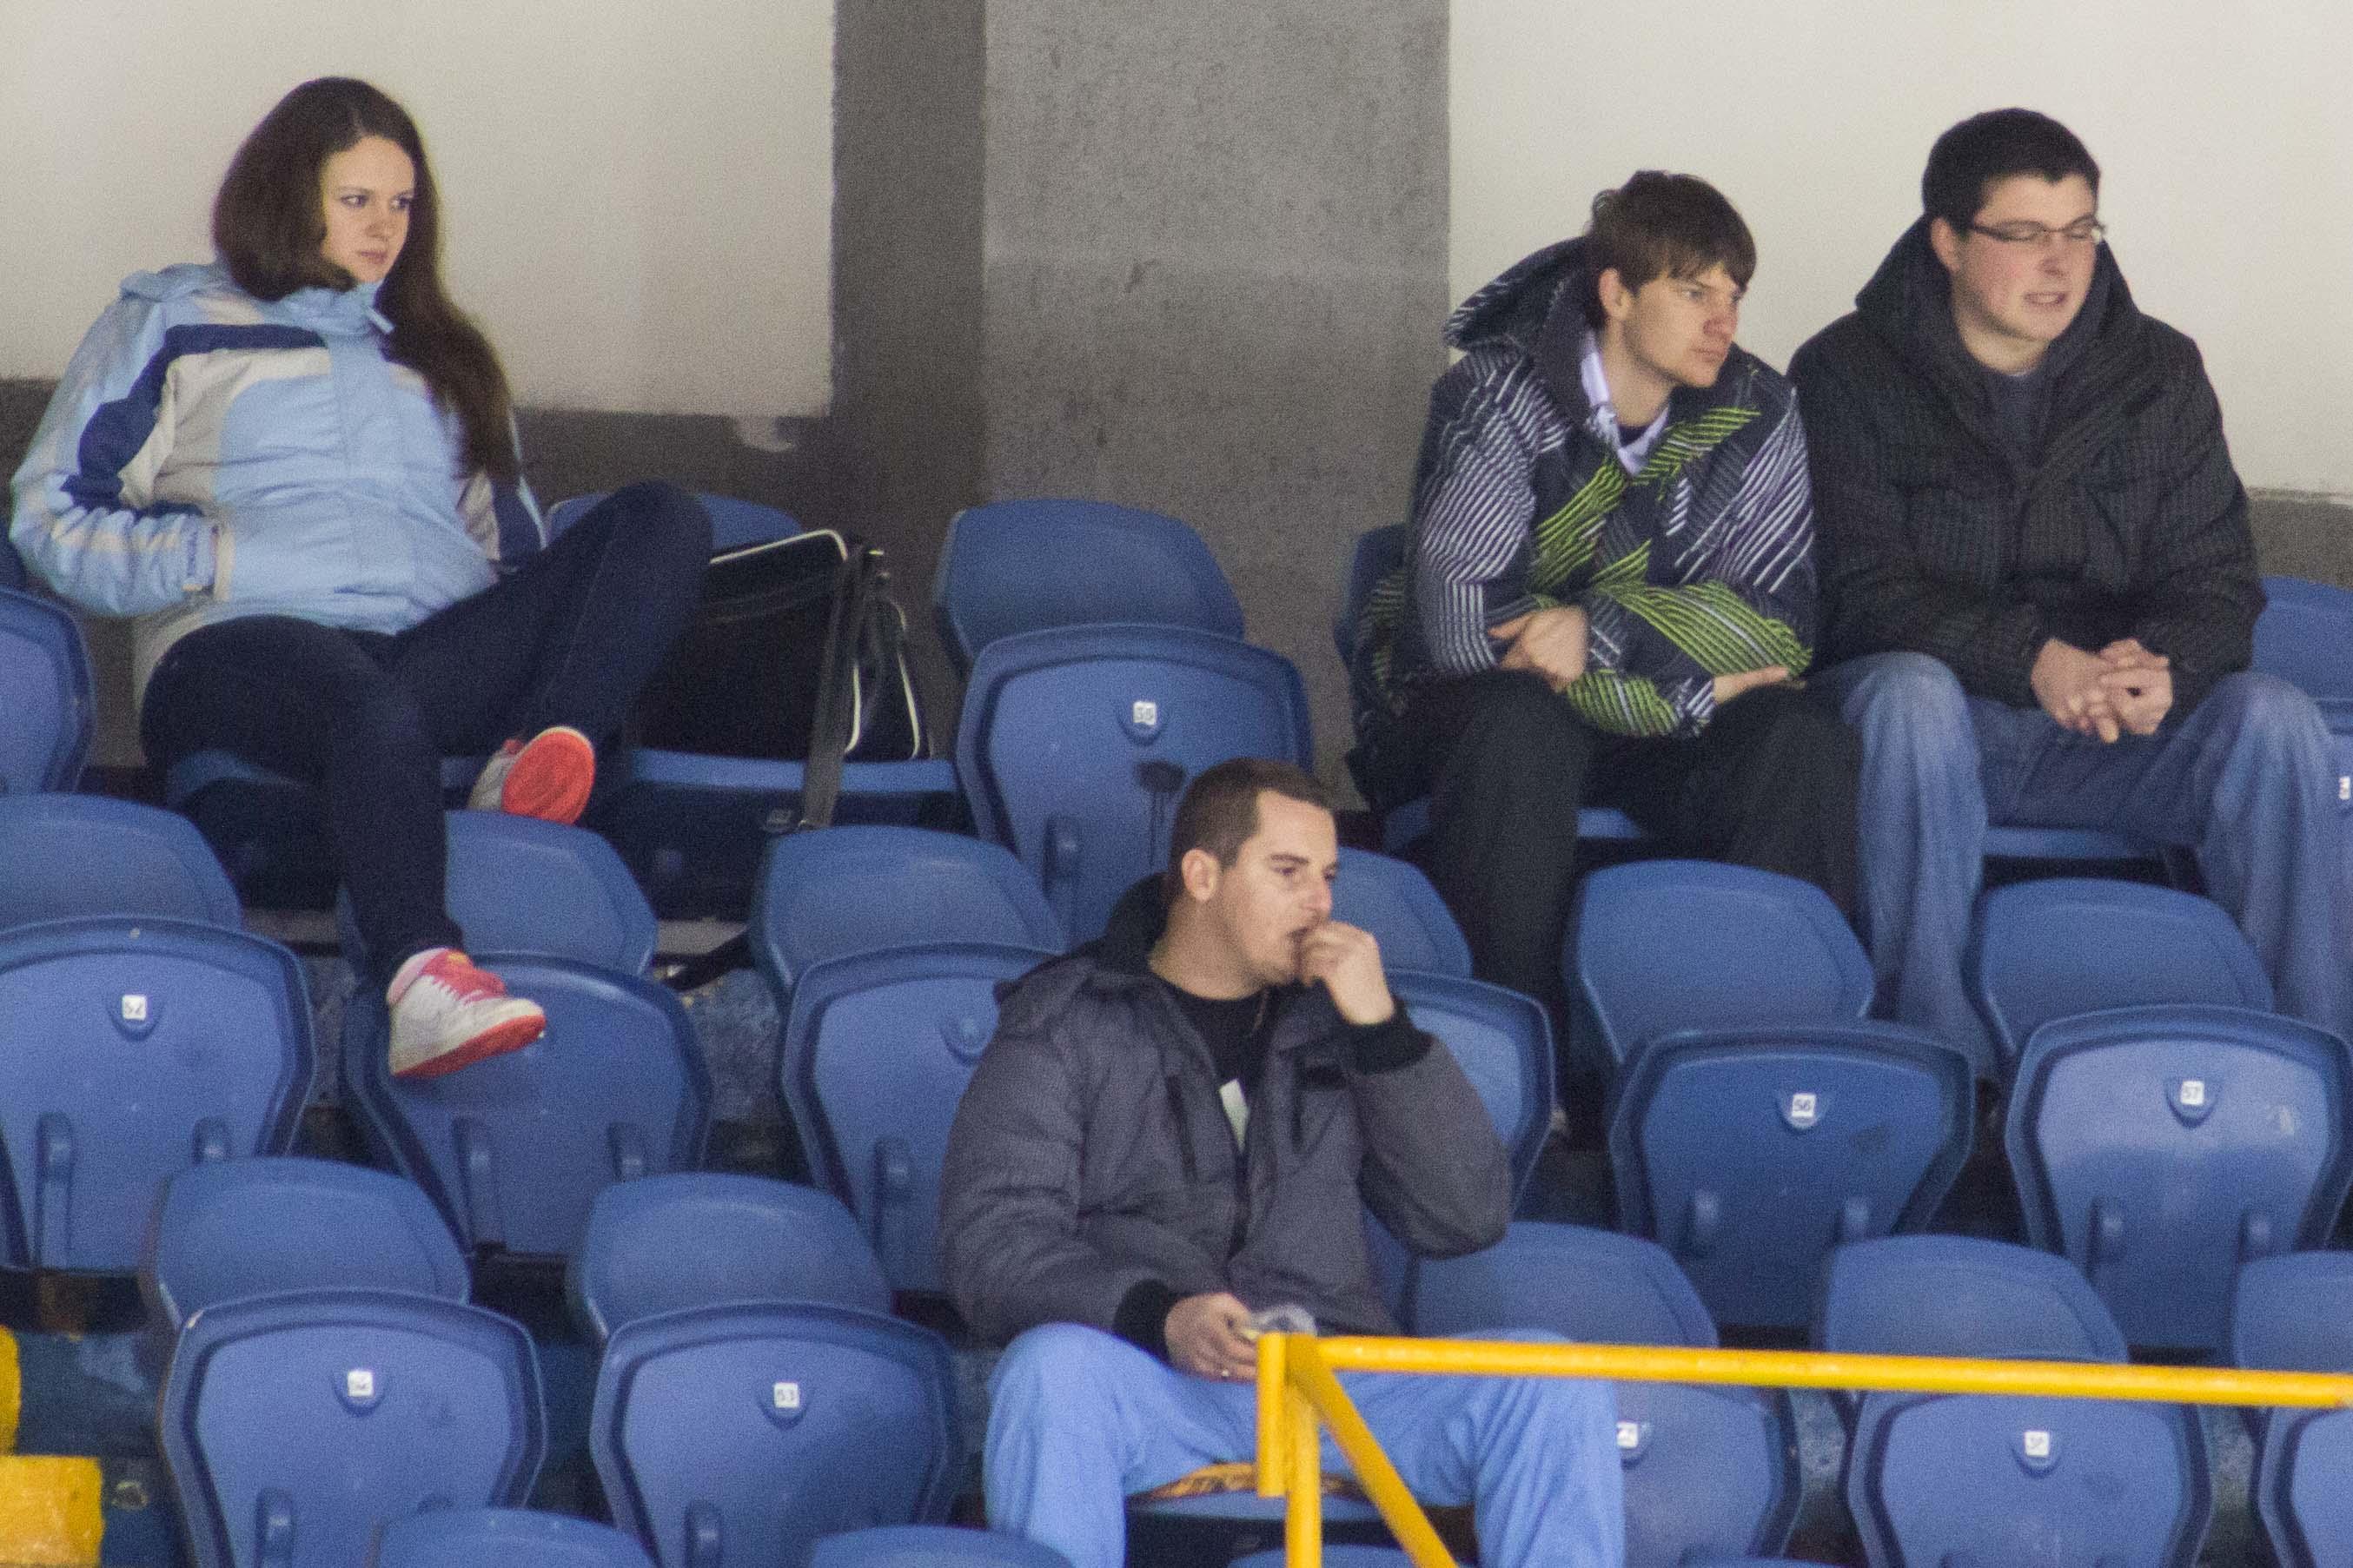 zhkm-zvolen-hc-spisska-n-ves-2013-hokej-23